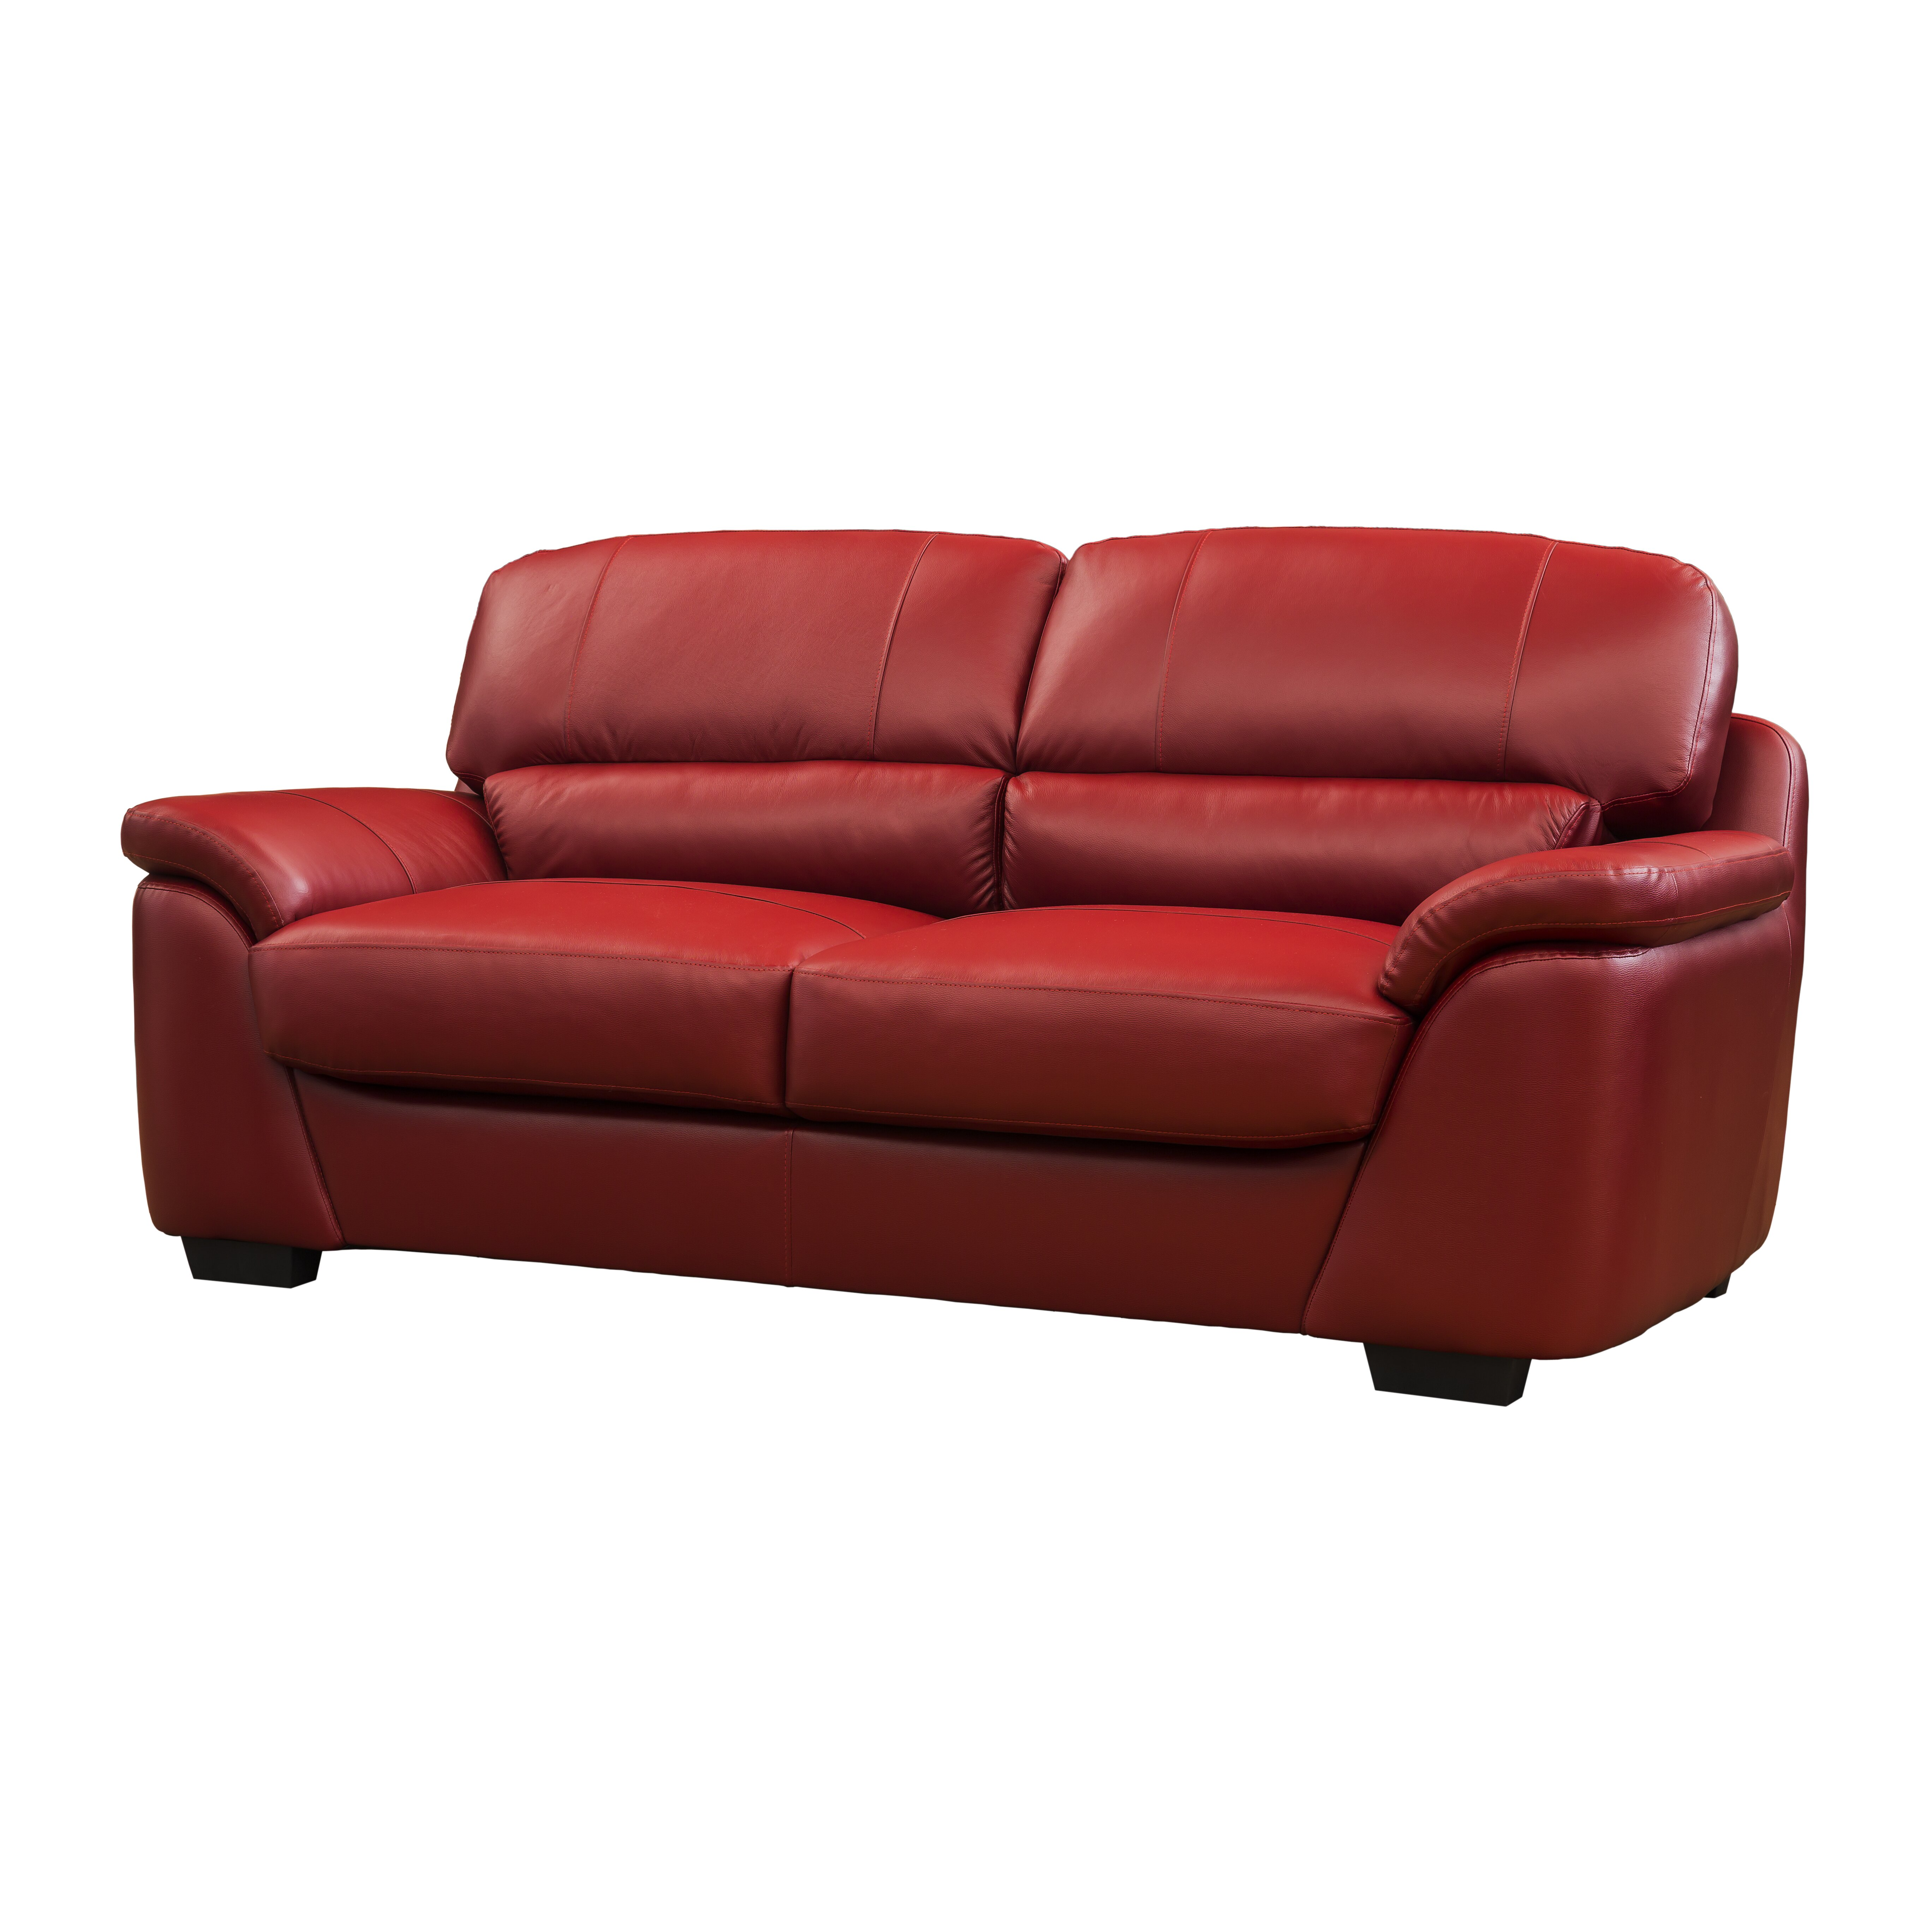 rose bay furniture bugatti leather 3 seater sofa wayfair uk. Black Bedroom Furniture Sets. Home Design Ideas